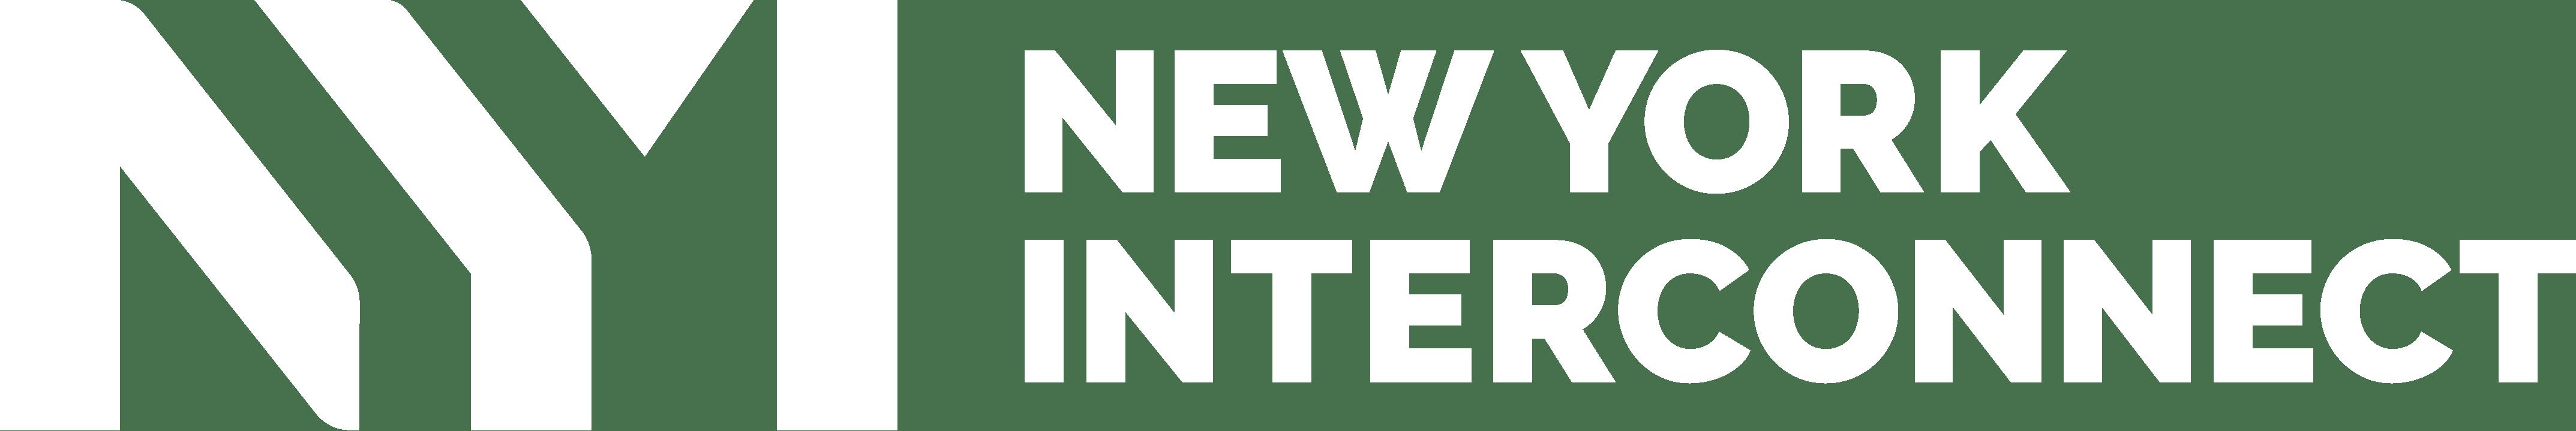 New York Interconnect